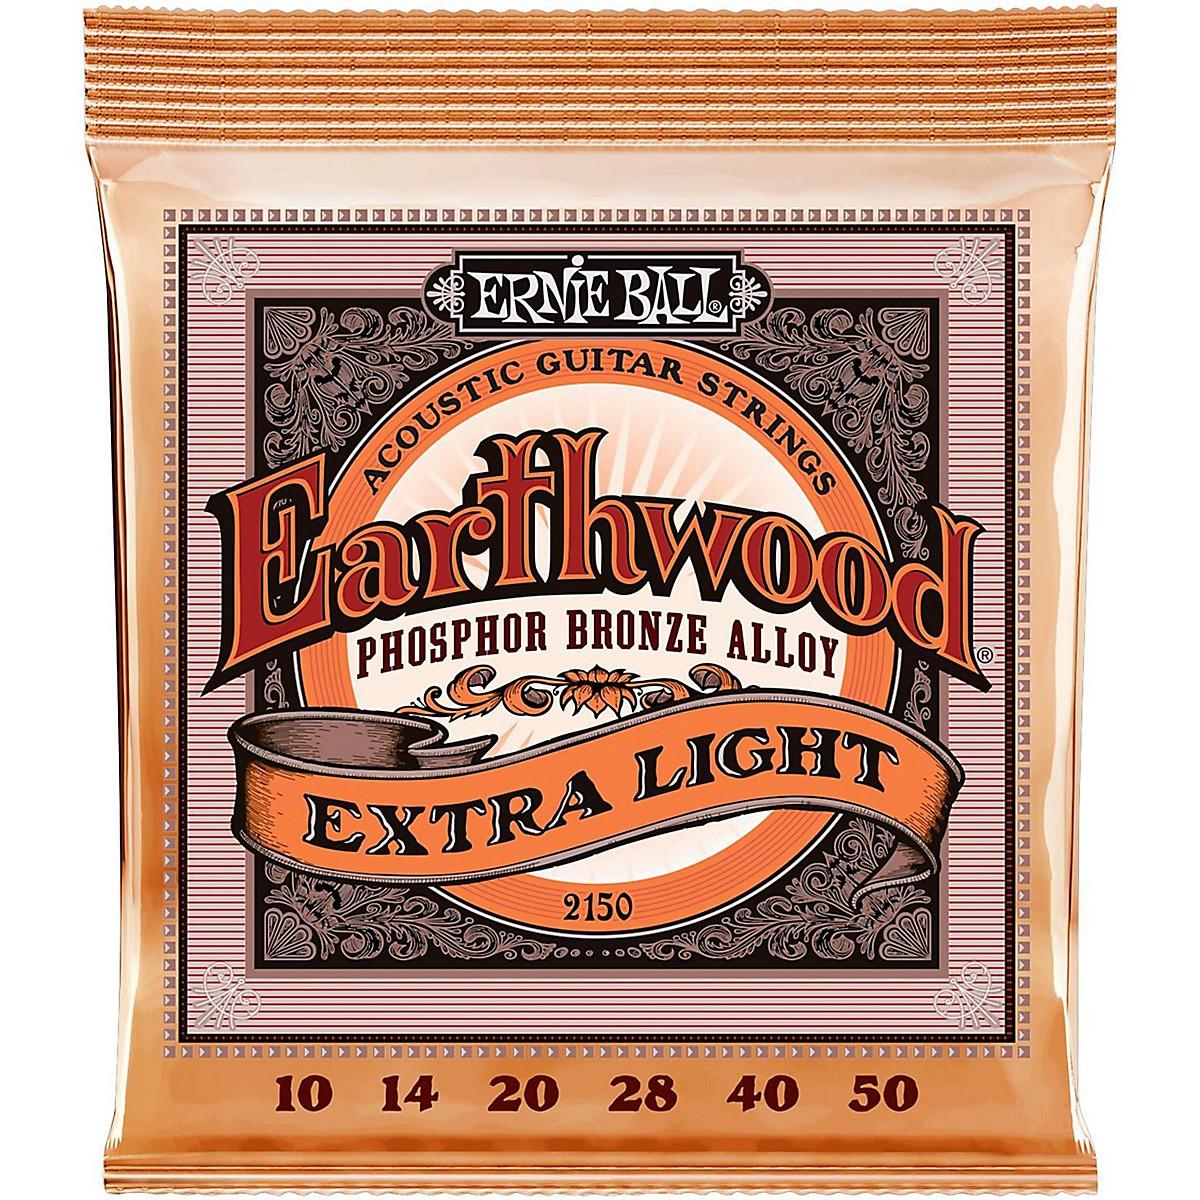 Ernie Ball 2150 Earthwood Phosphor Bronze Extra Light Acoustic Guitar Strings